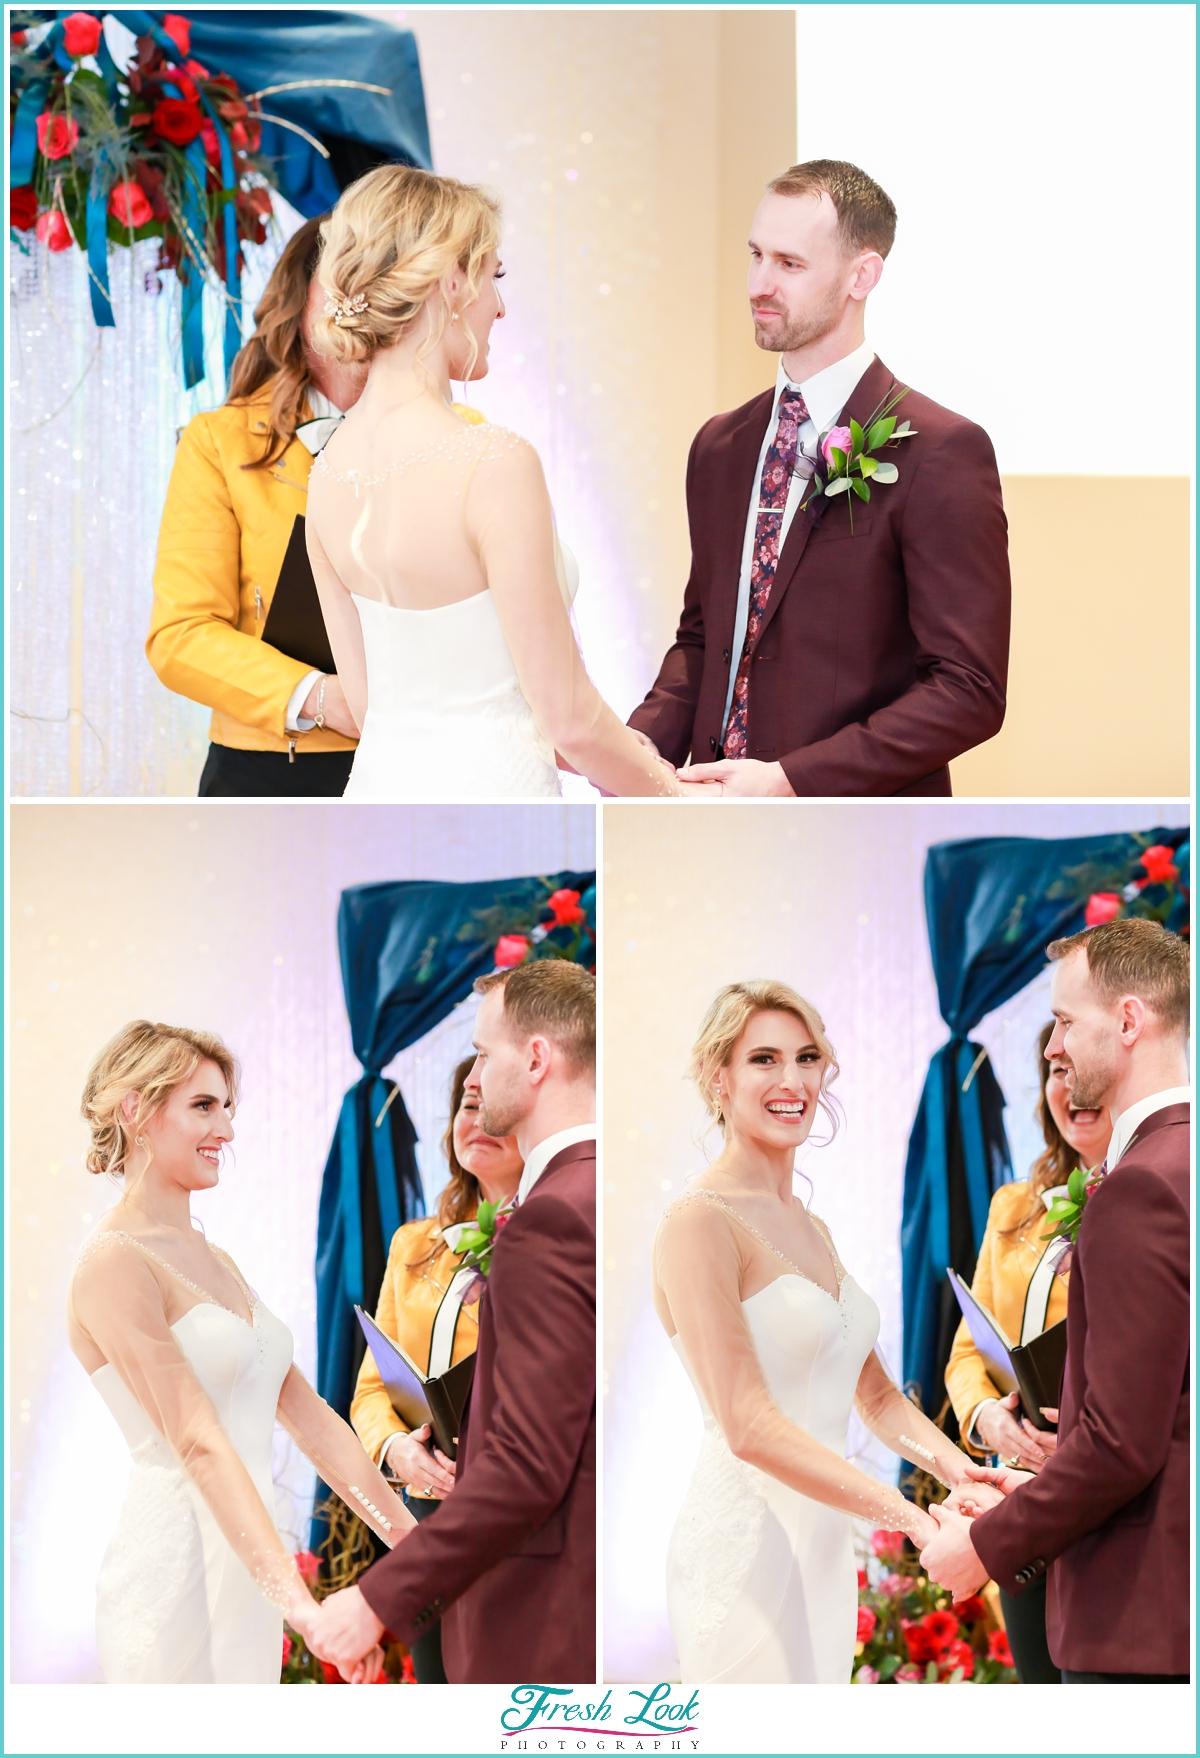 Indoor wedding ceremony at Mambo room